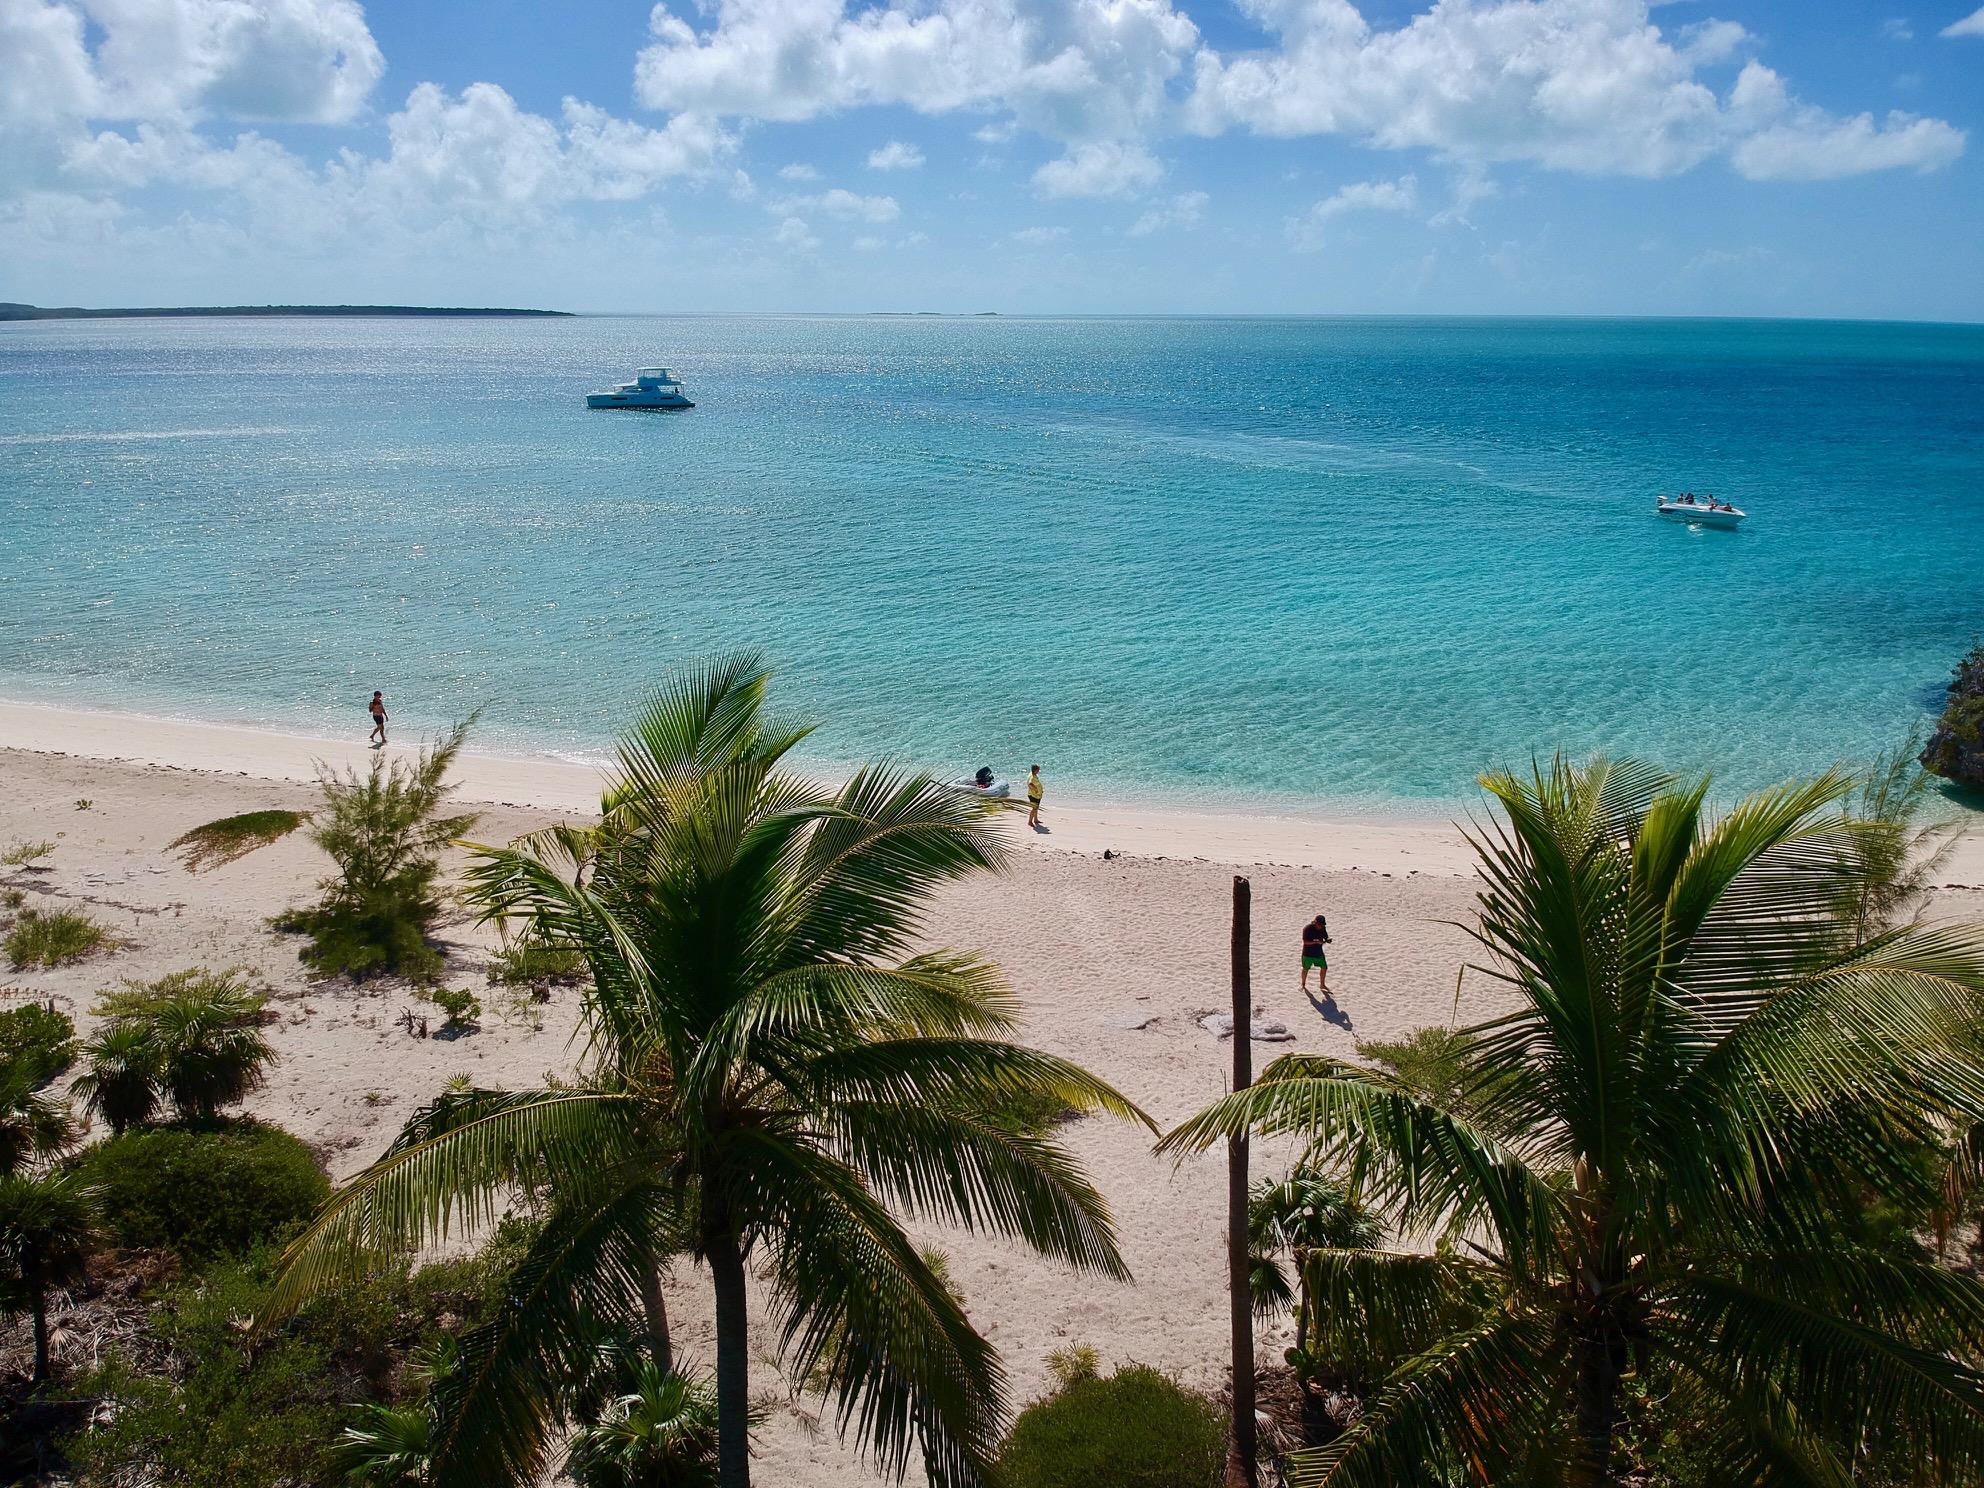 Alquiler-barco-Caribe-yate-motor-velero-catamaran-turismo-vacaciones-Bahamas